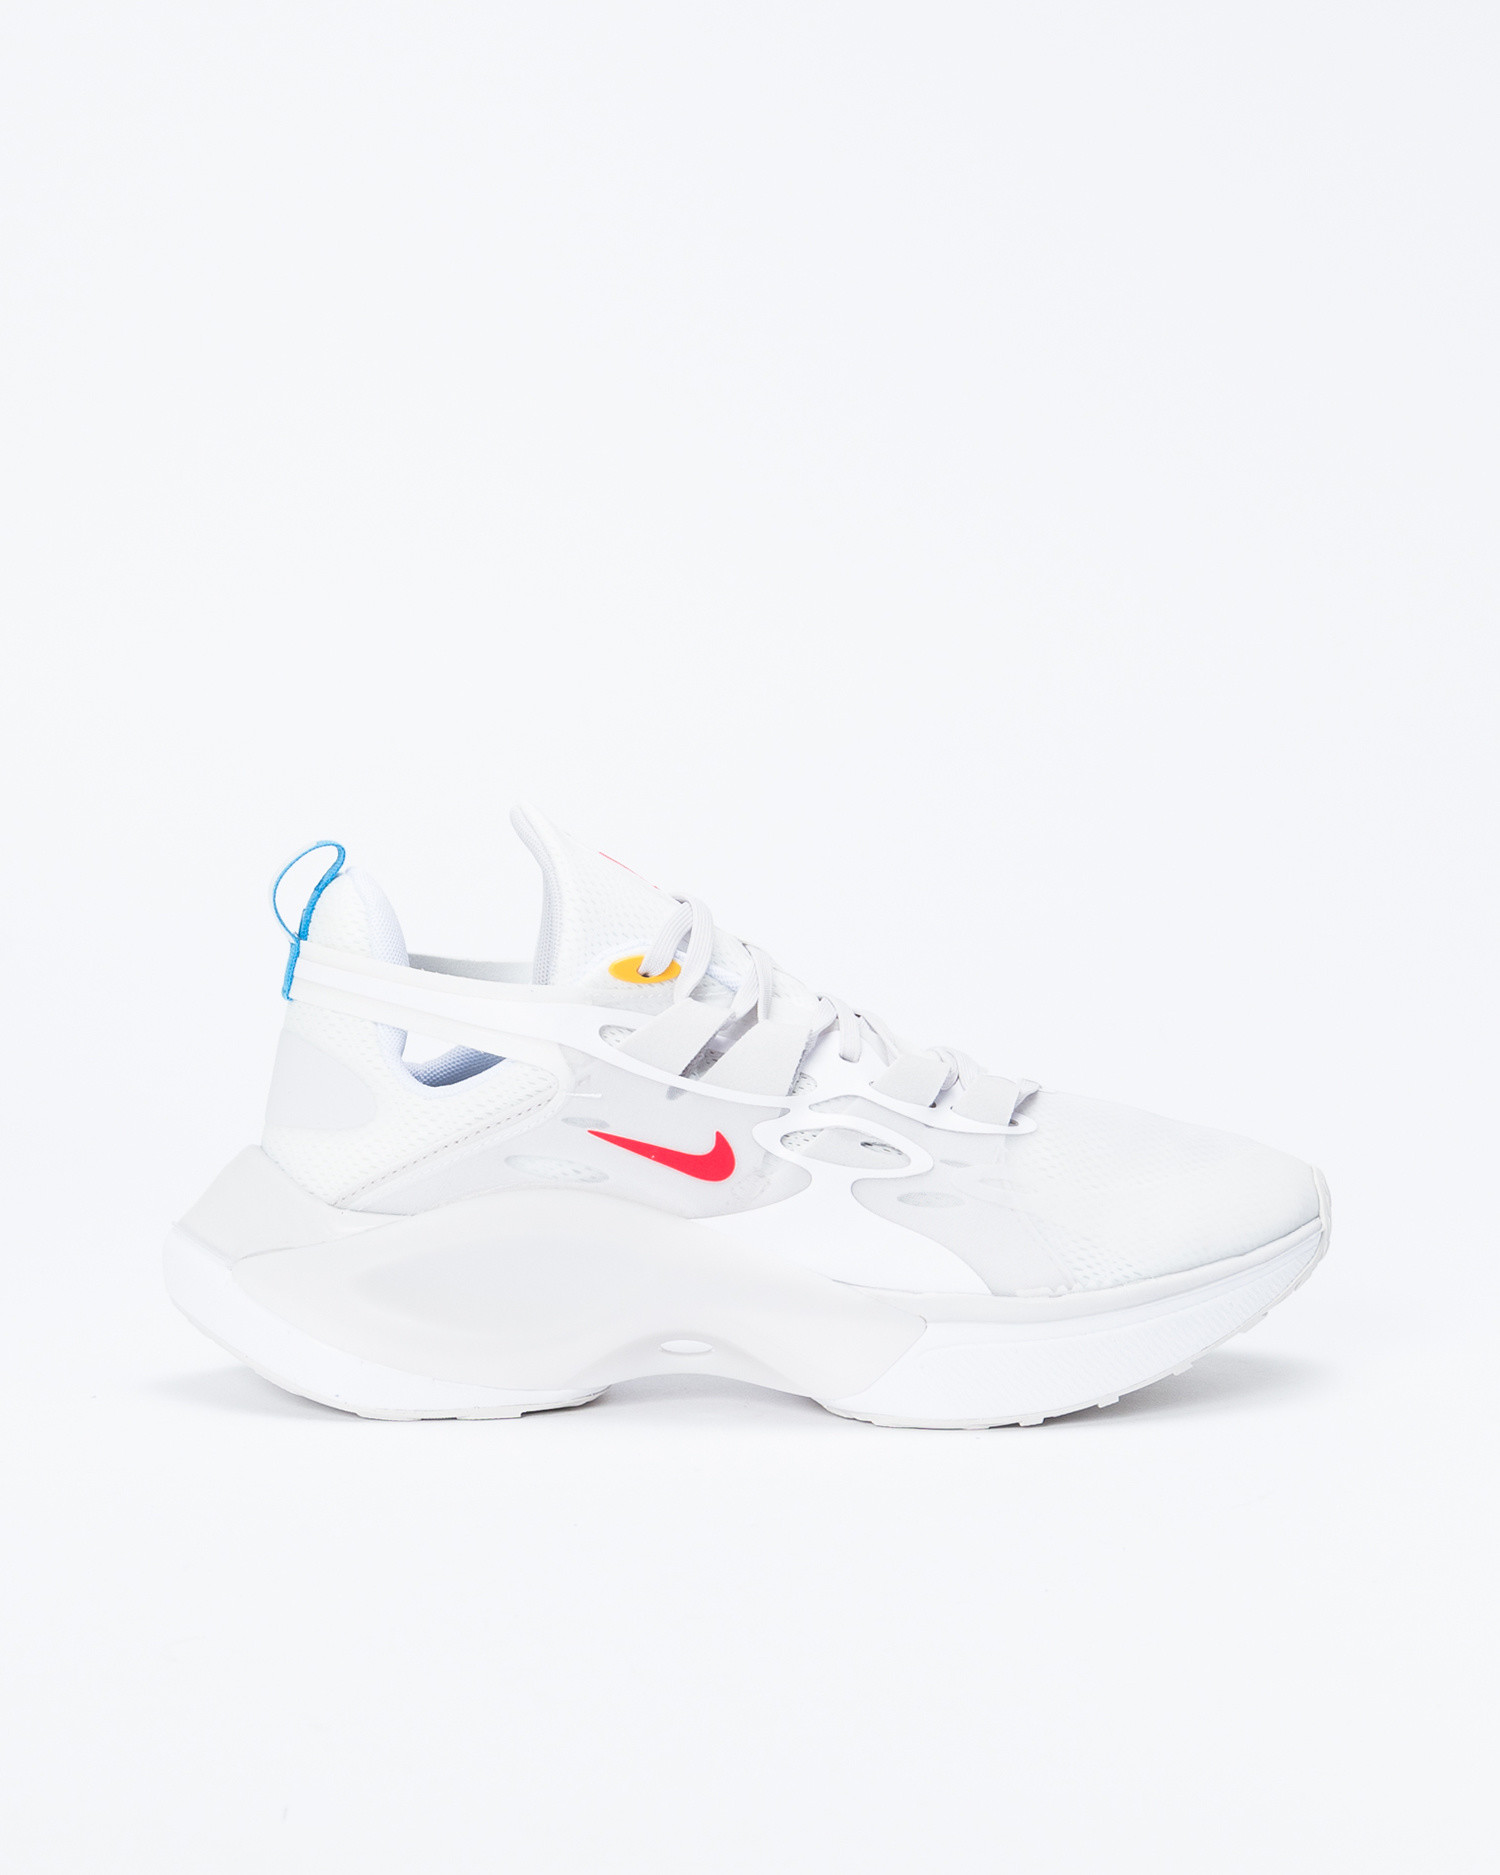 Nike Signal d ms x /White/Red orbit-Summit white-Blue hero